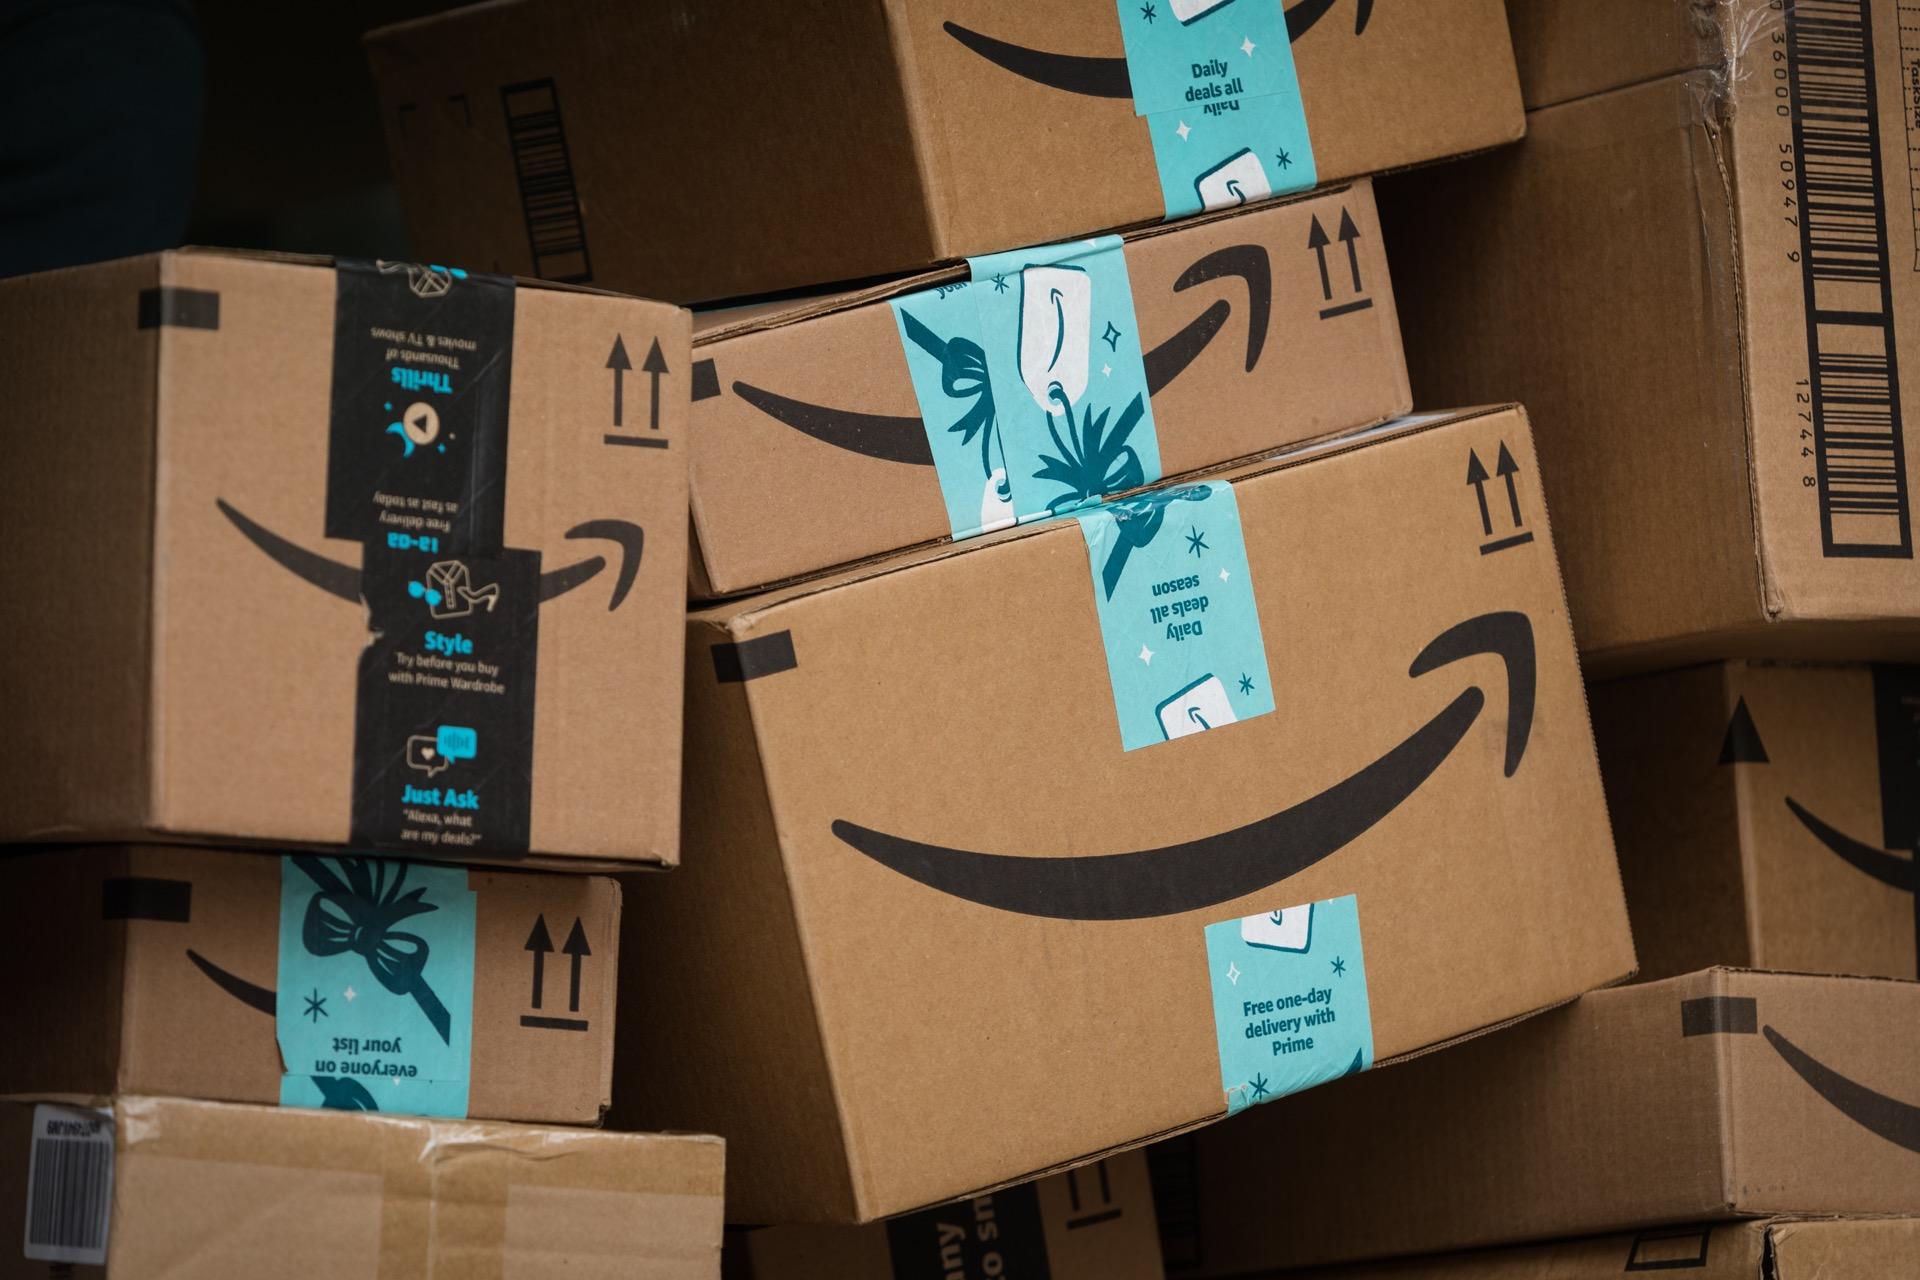 Amazon delivers defeat against union efforts but still faces HR challenges